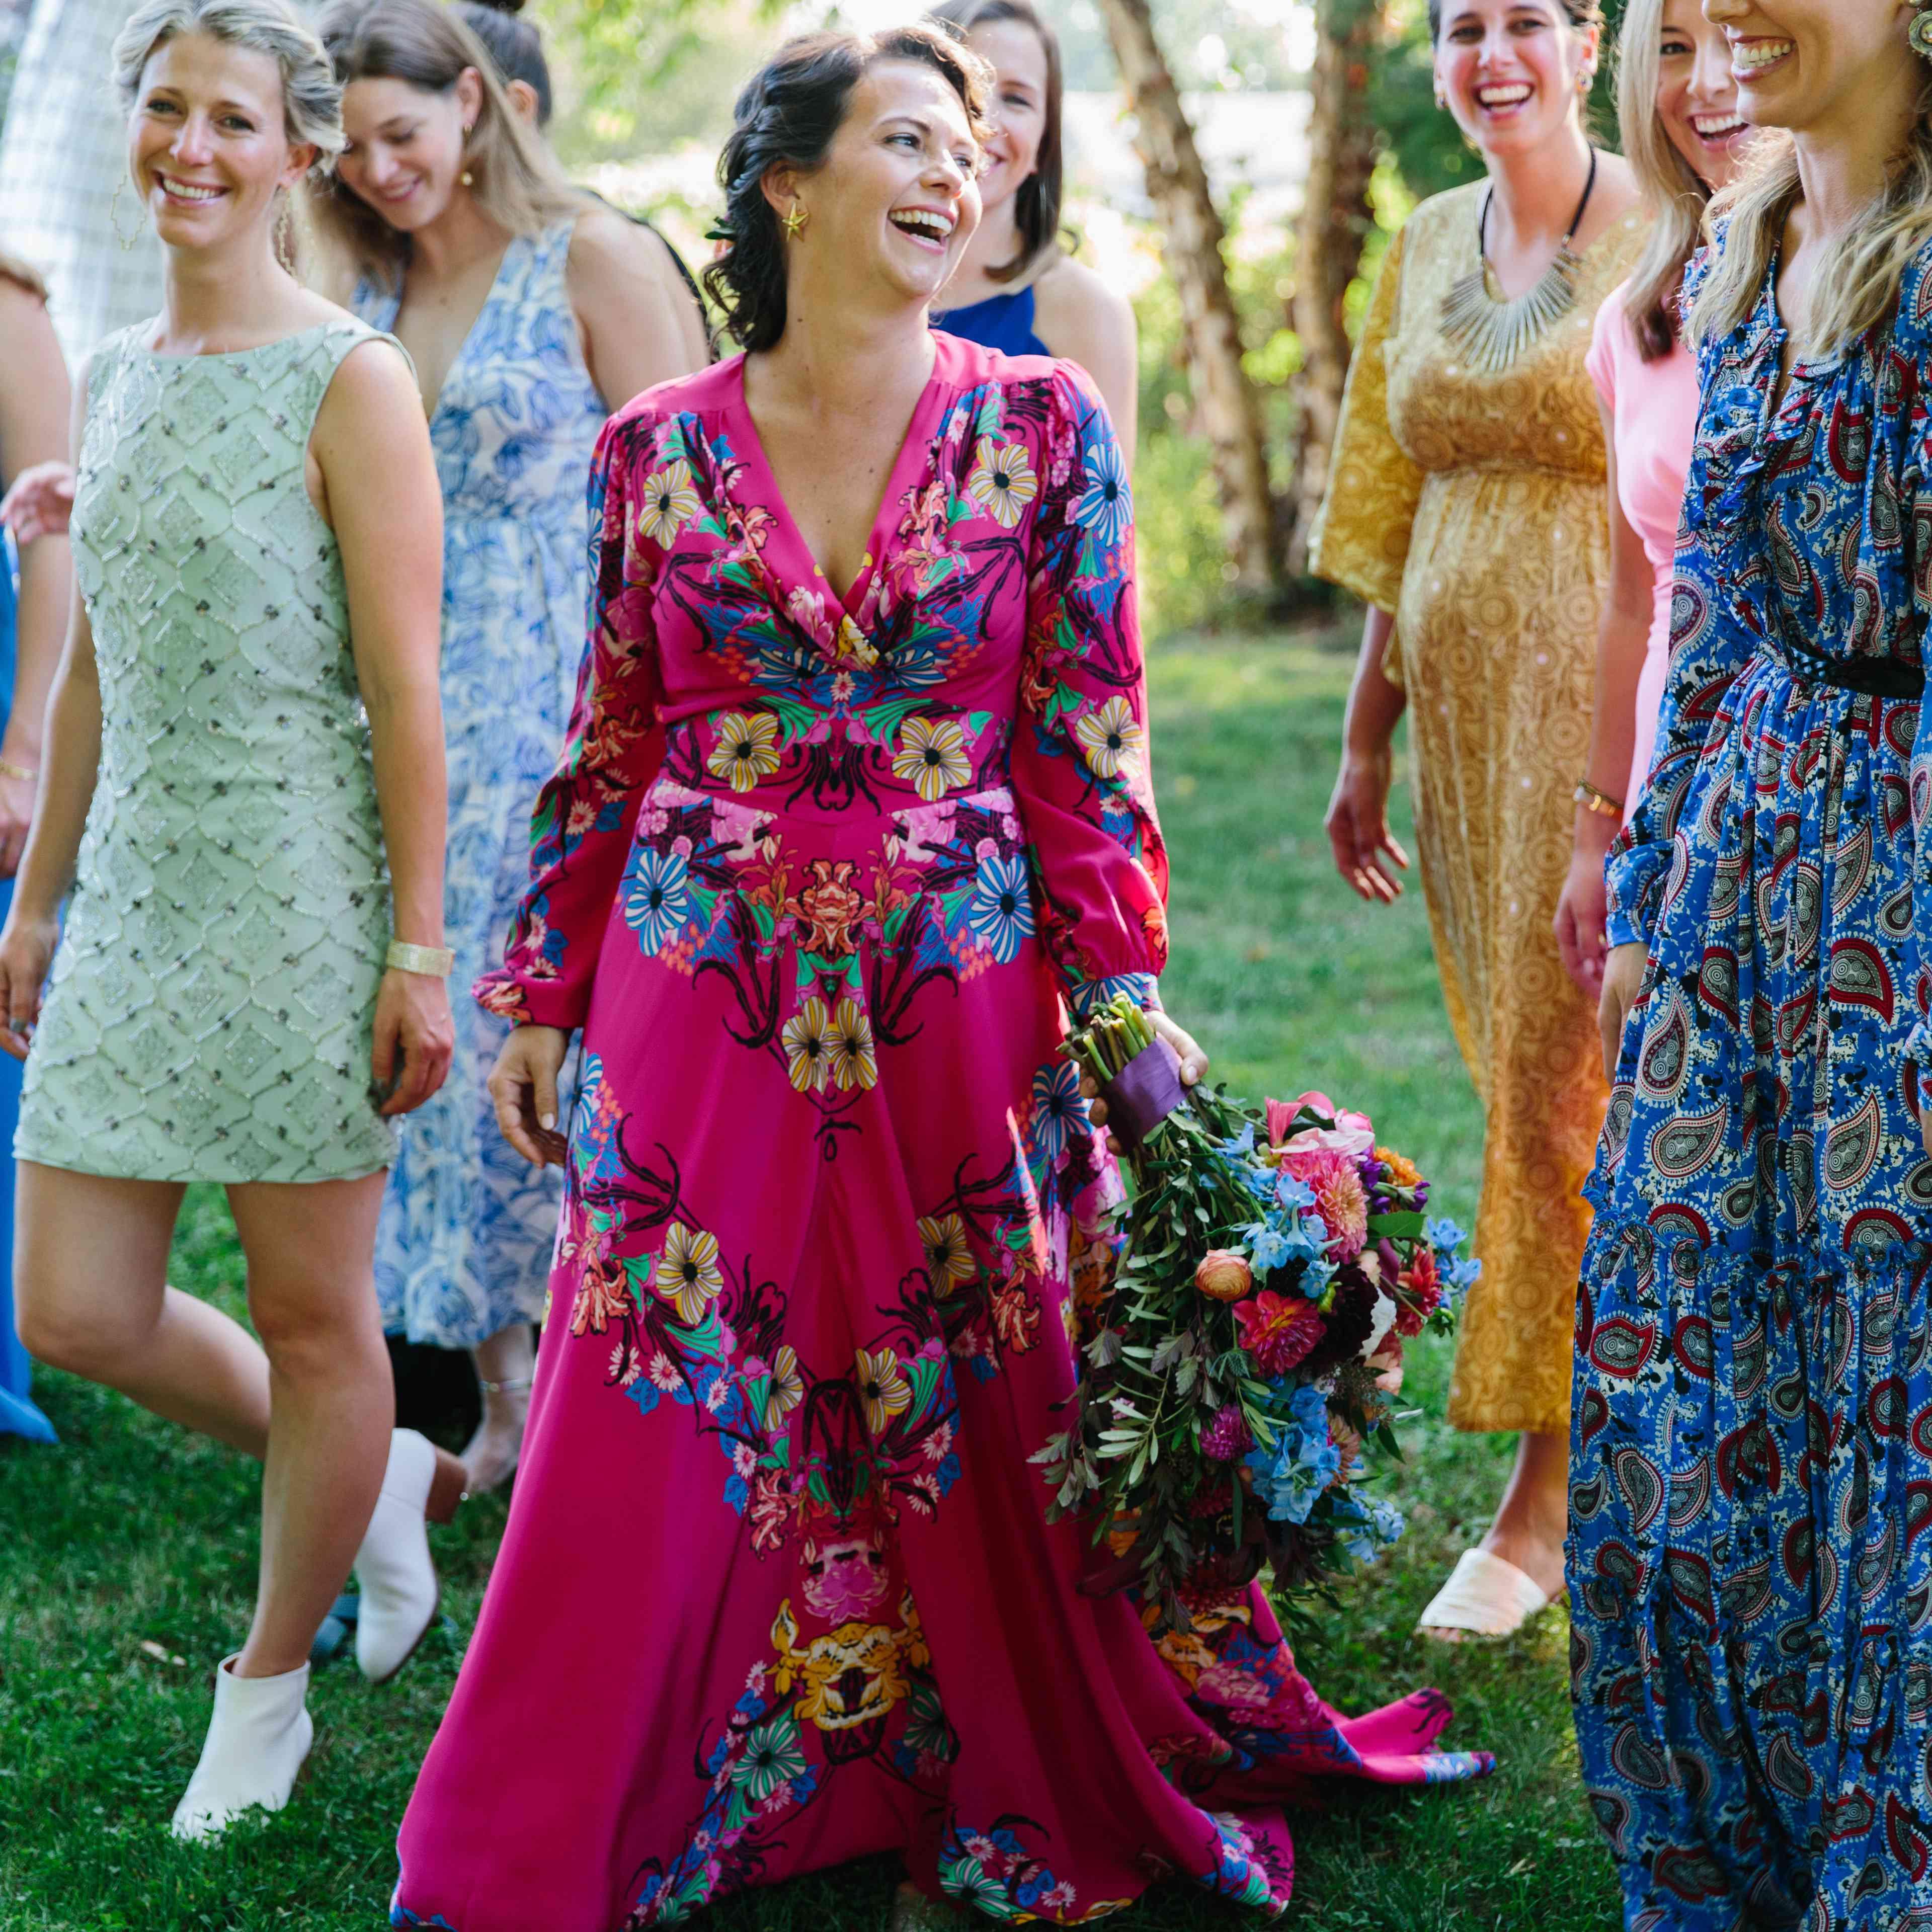 women wearing colorful dresses